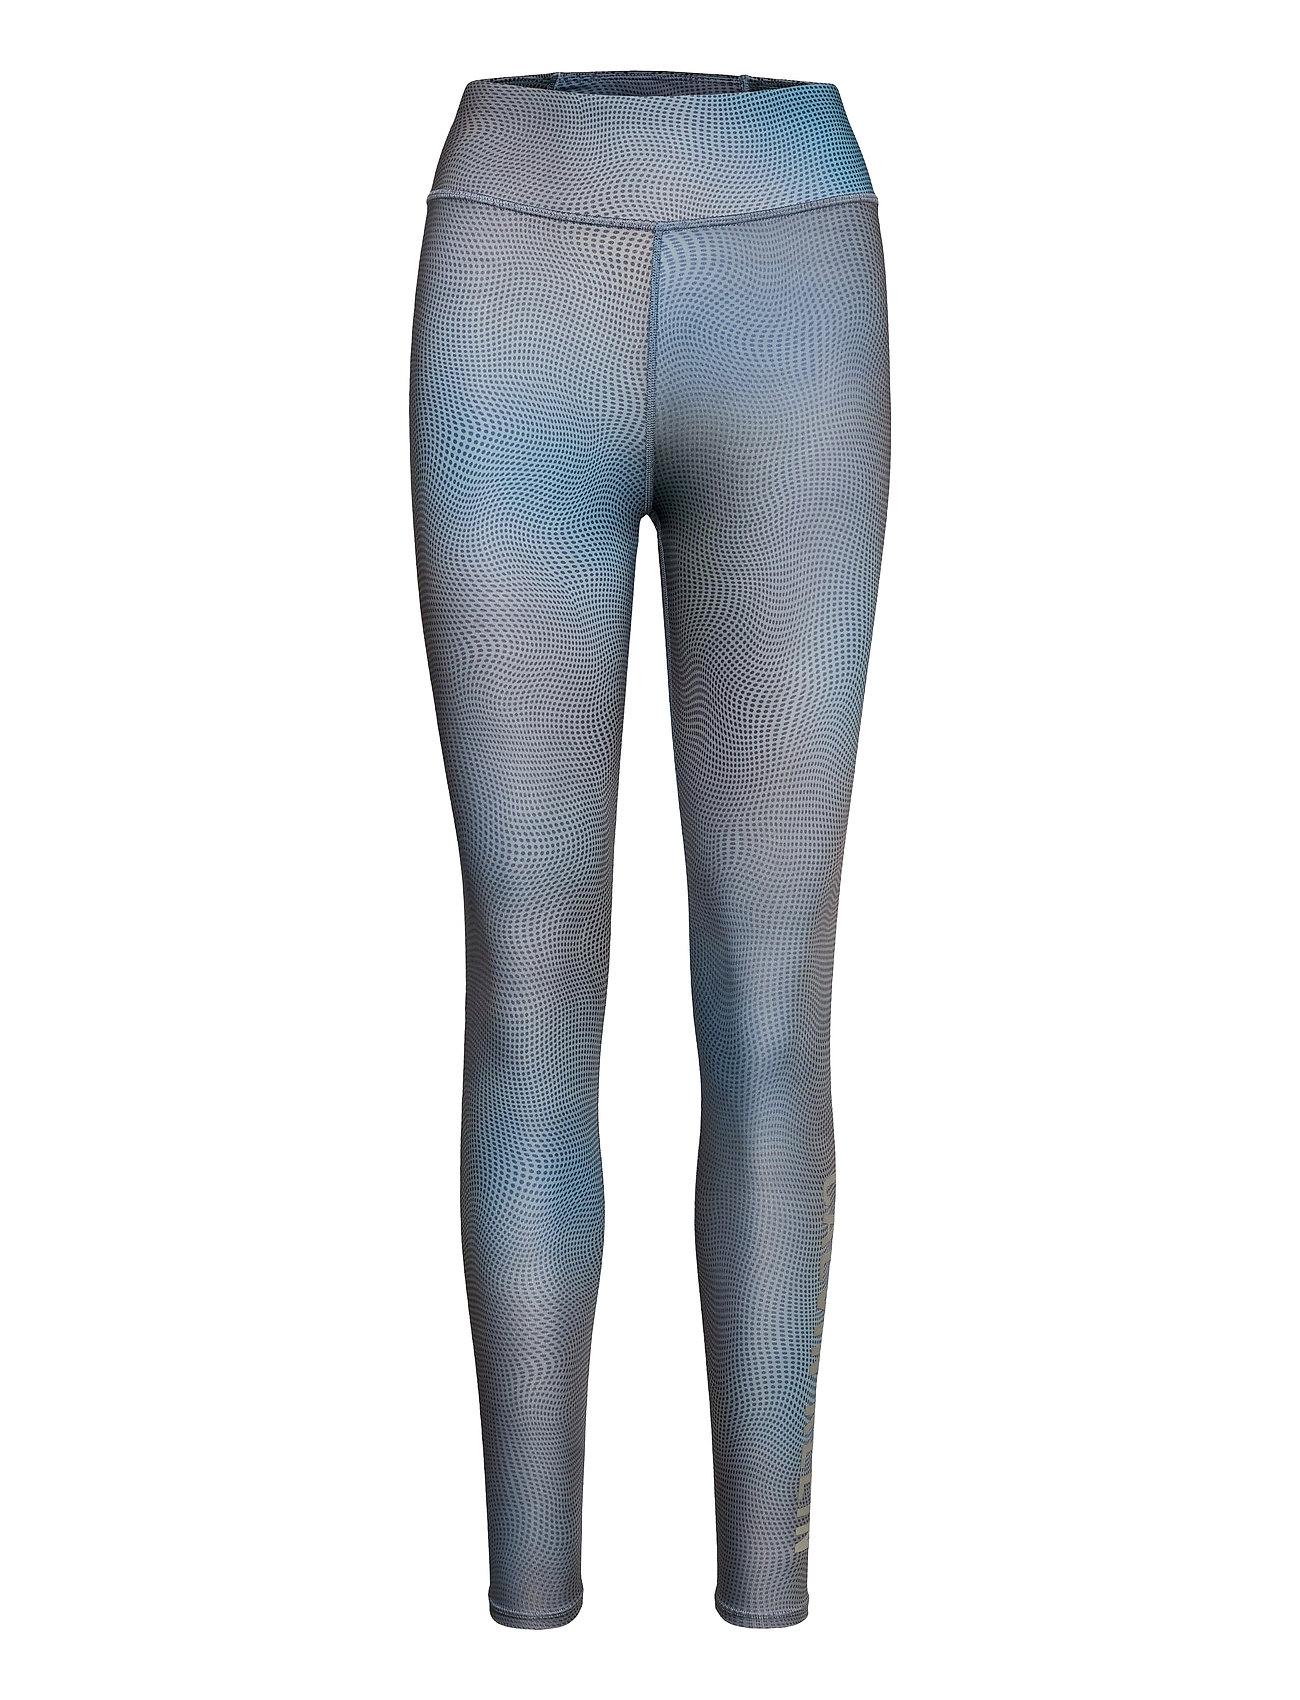 Image of Wo - Aop Full Length Tight Running/training Tights Blå Calvin Klein Performance (3513566719)